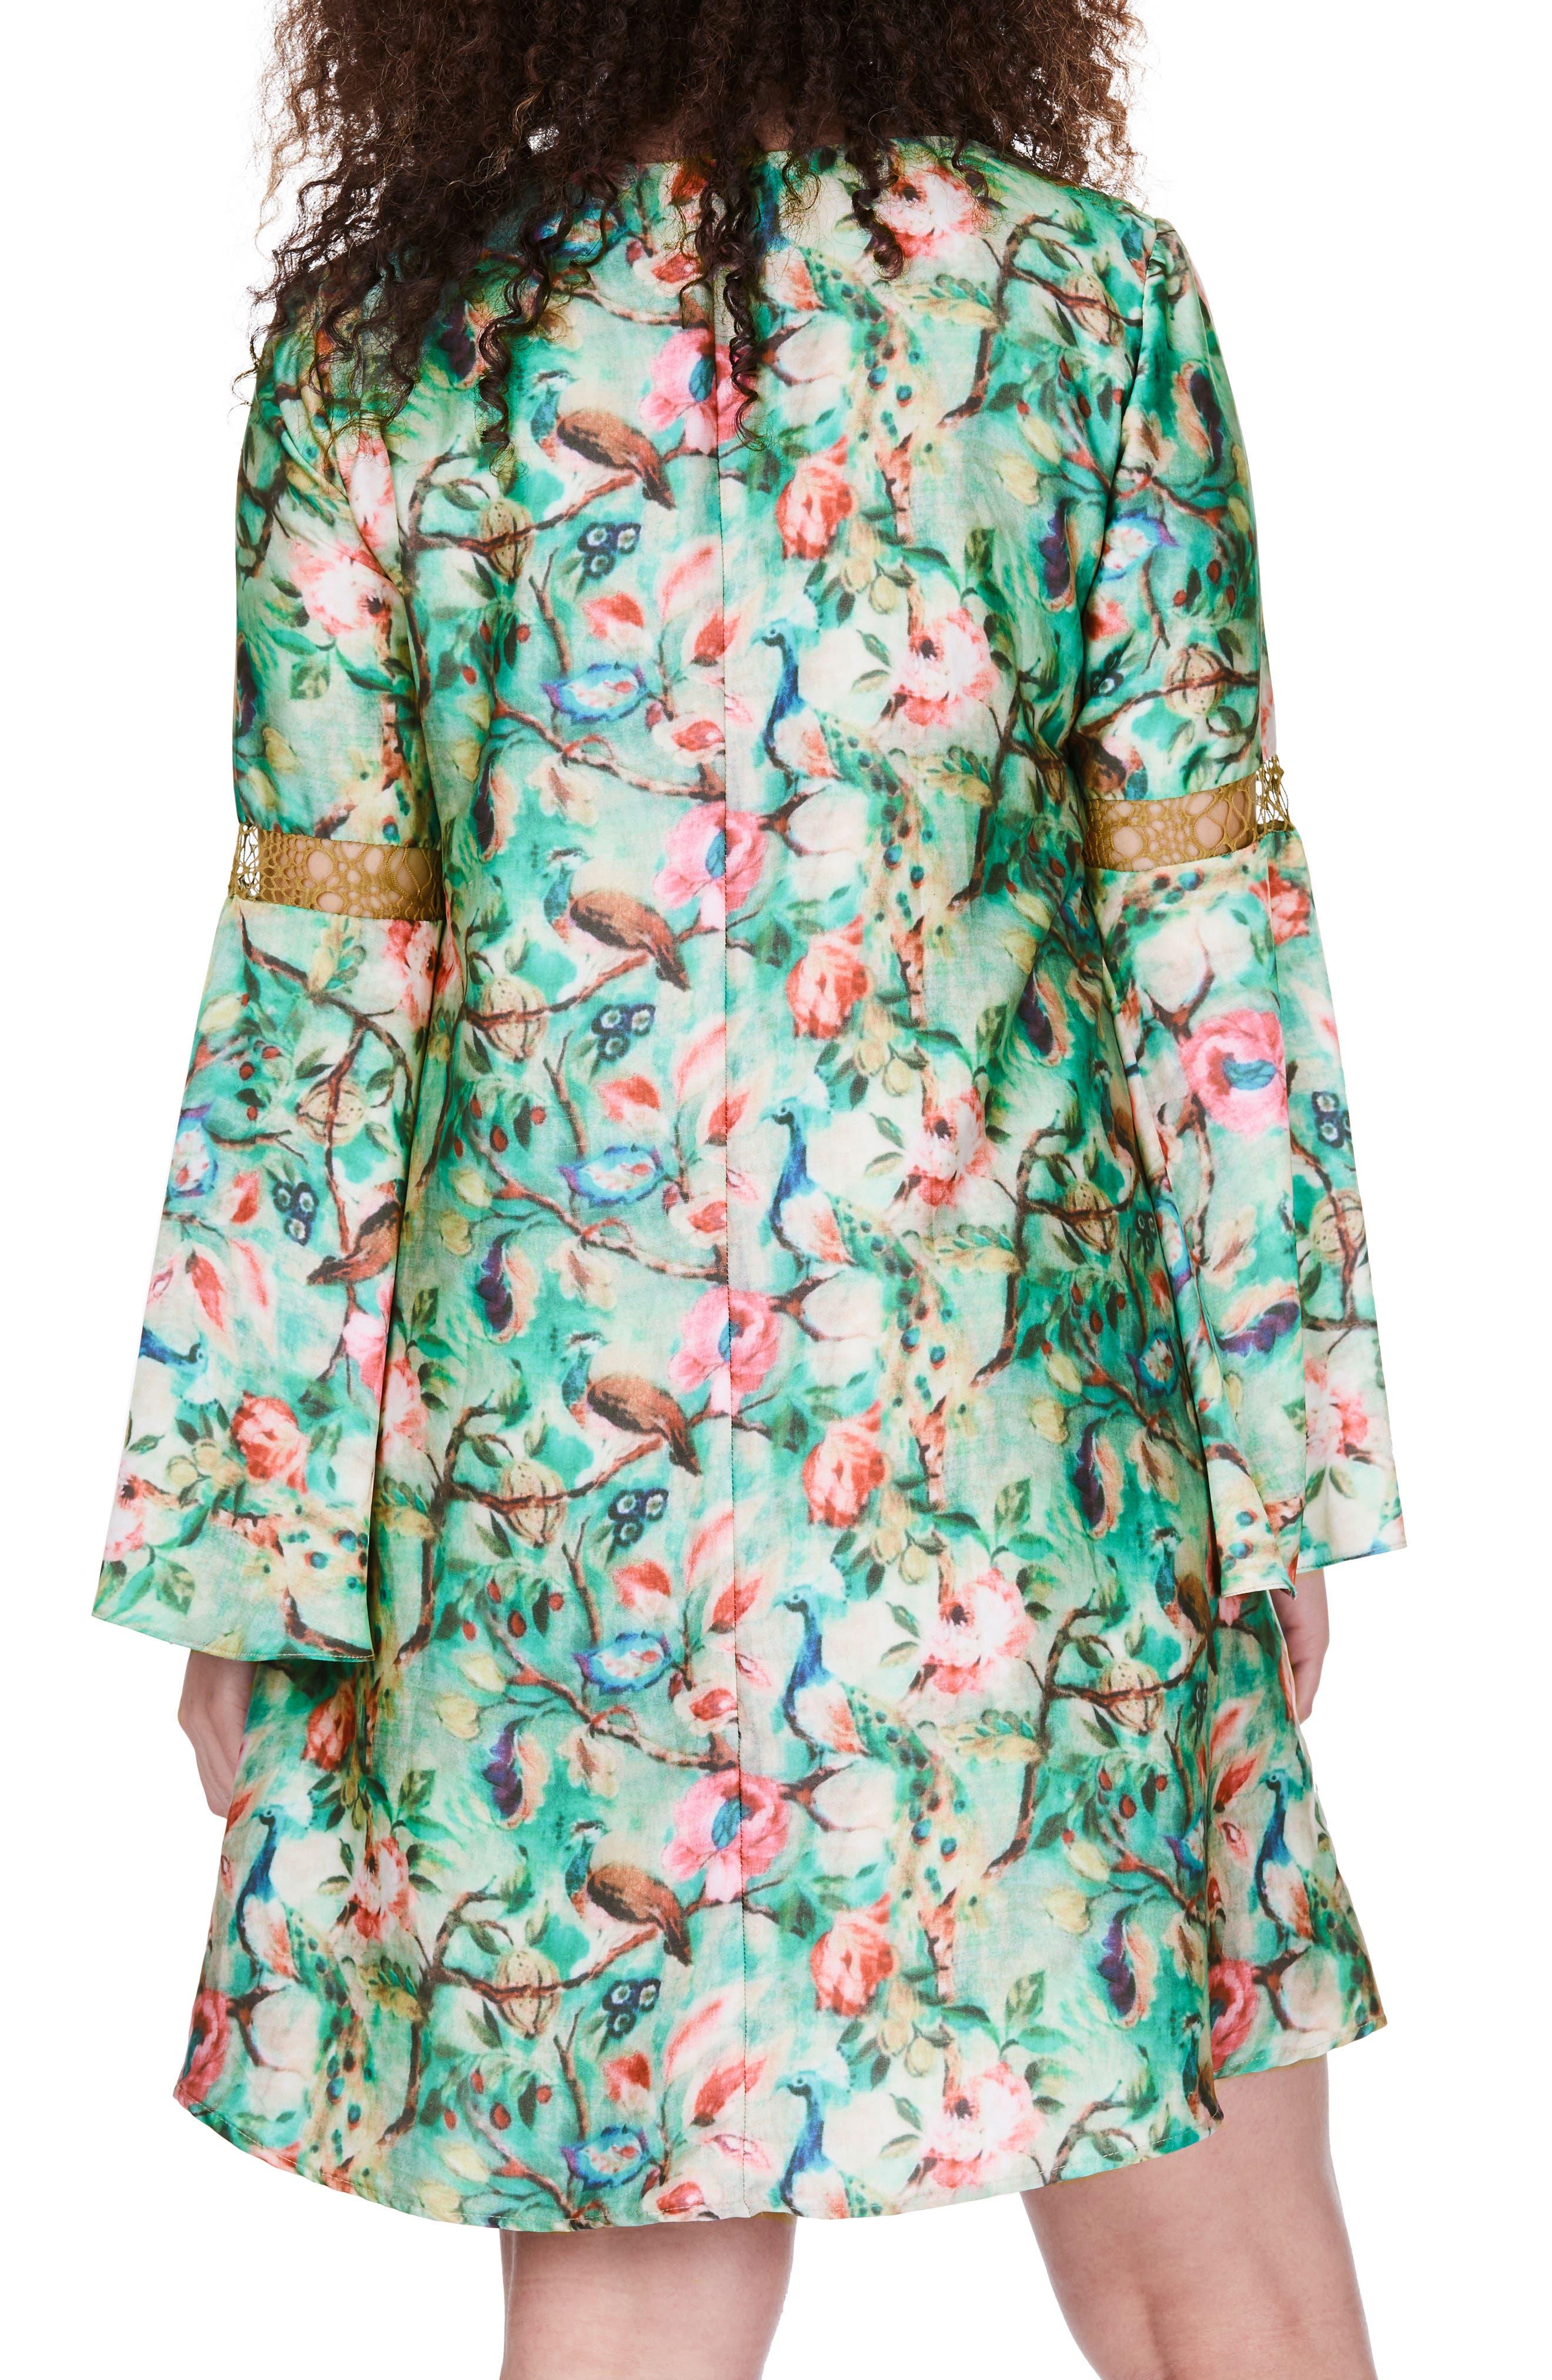 Bell Sleeve Floral Shift Dress,                             Alternate thumbnail 2, color,                             300